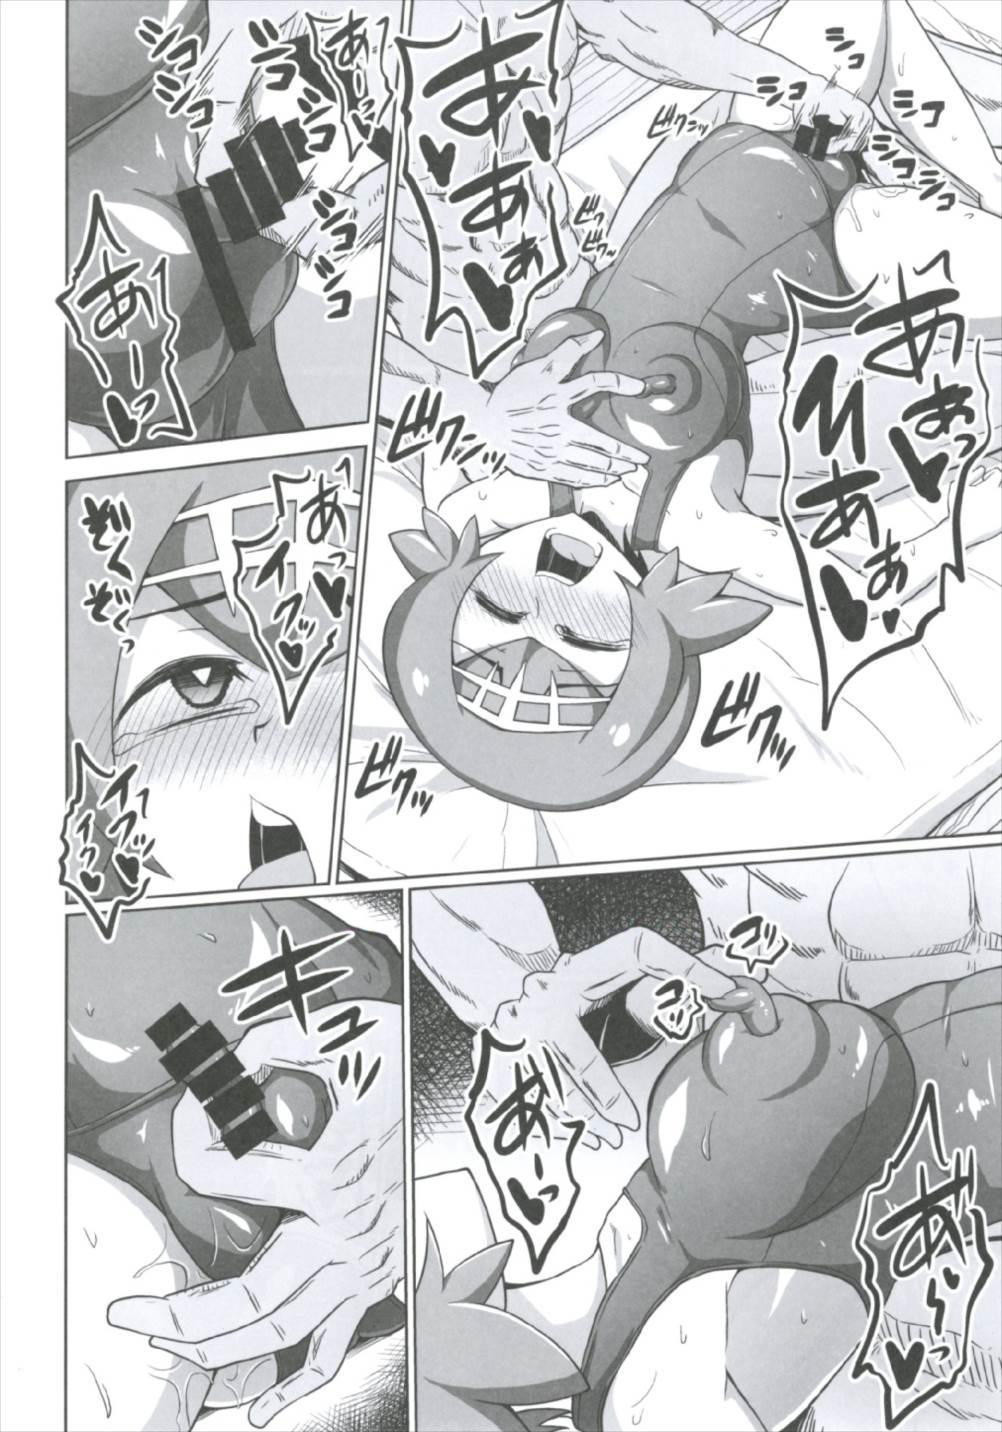 (C92) [Forever and ever (Eisen)] BOKKIMON -Suiren-chan wa H ni Kyoumi Shinshin- (Pokémon Sun and Moon) 13